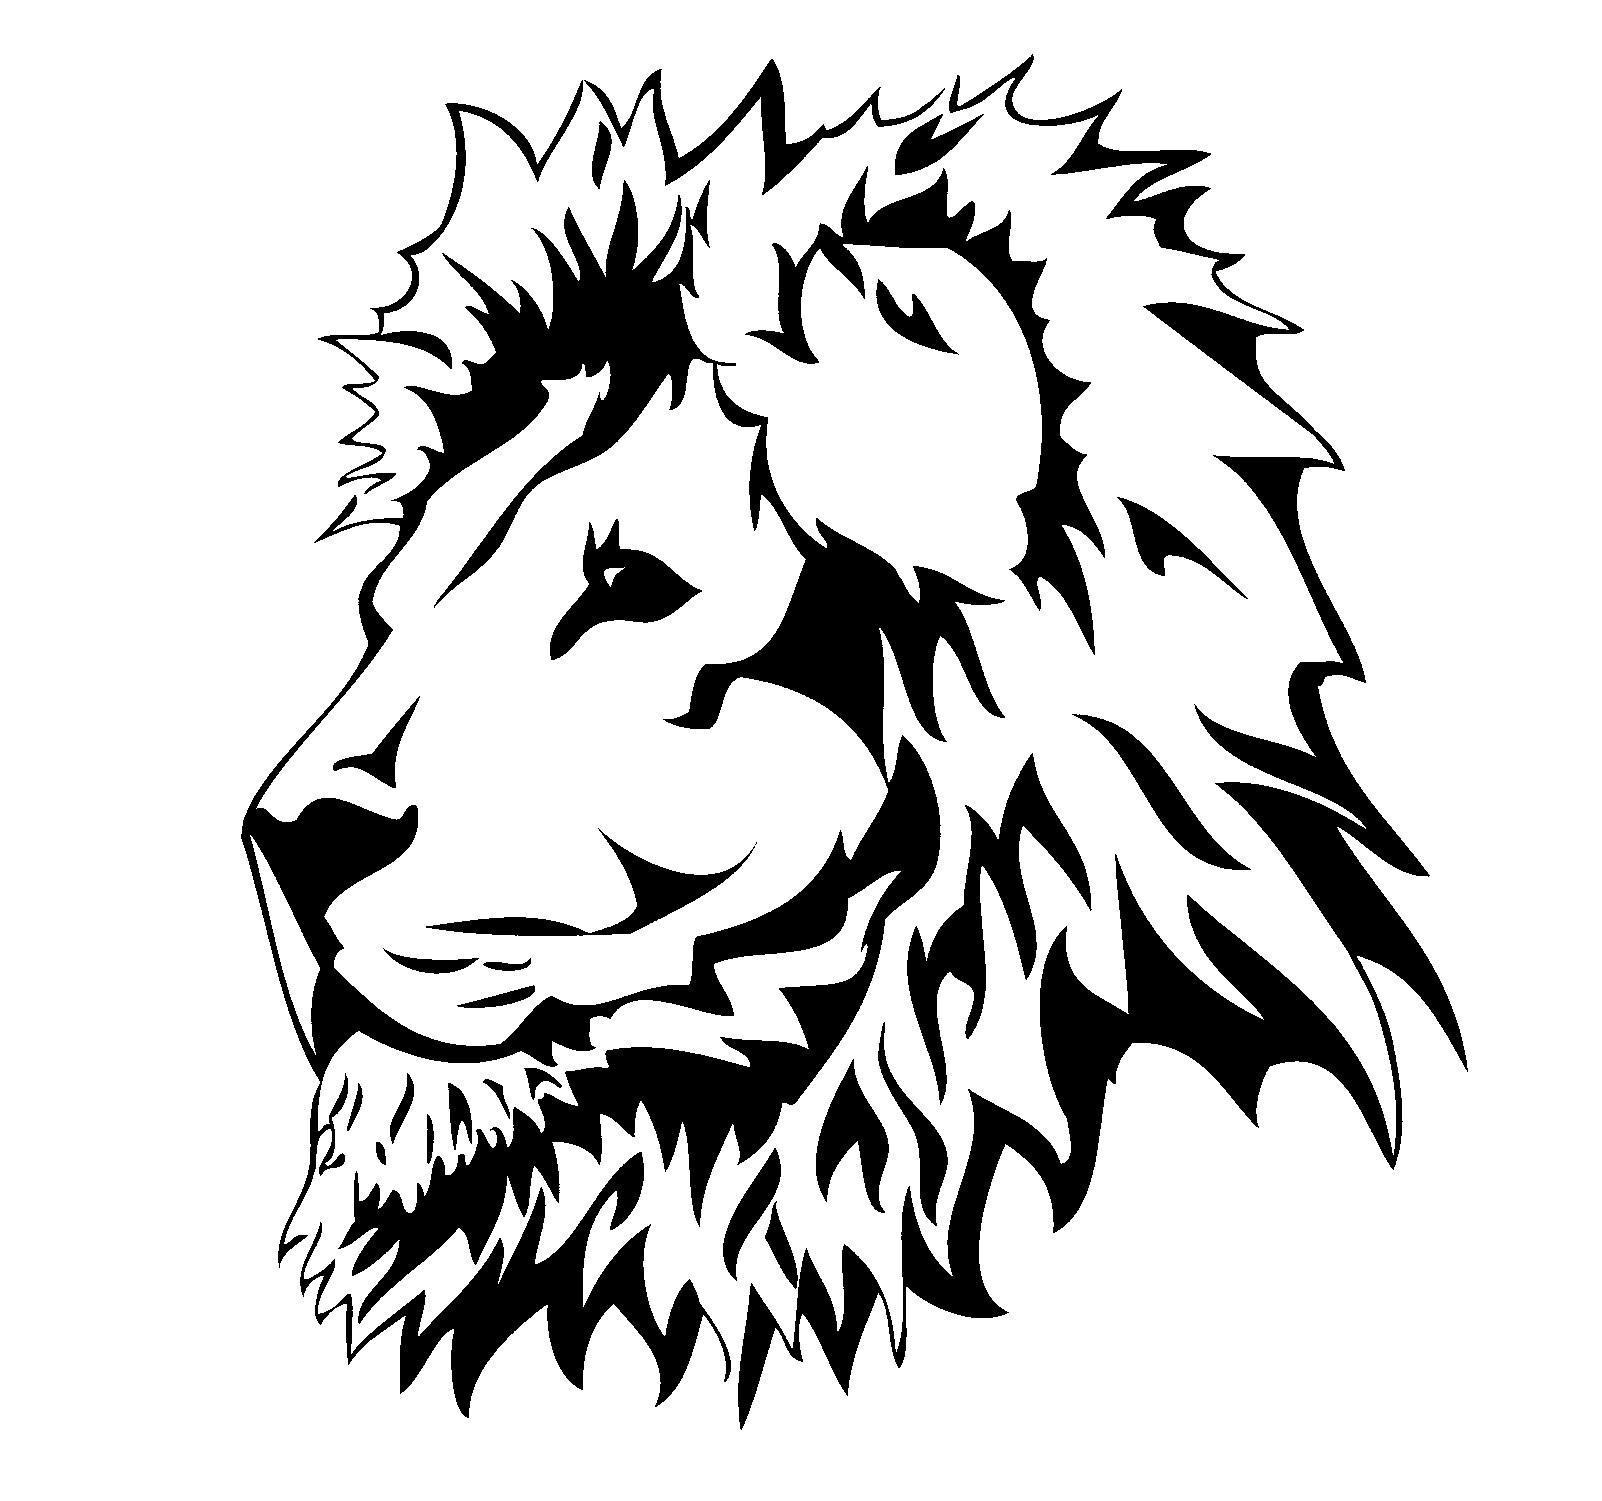 Lion head clipart black and white 7 » Clipart Portal.